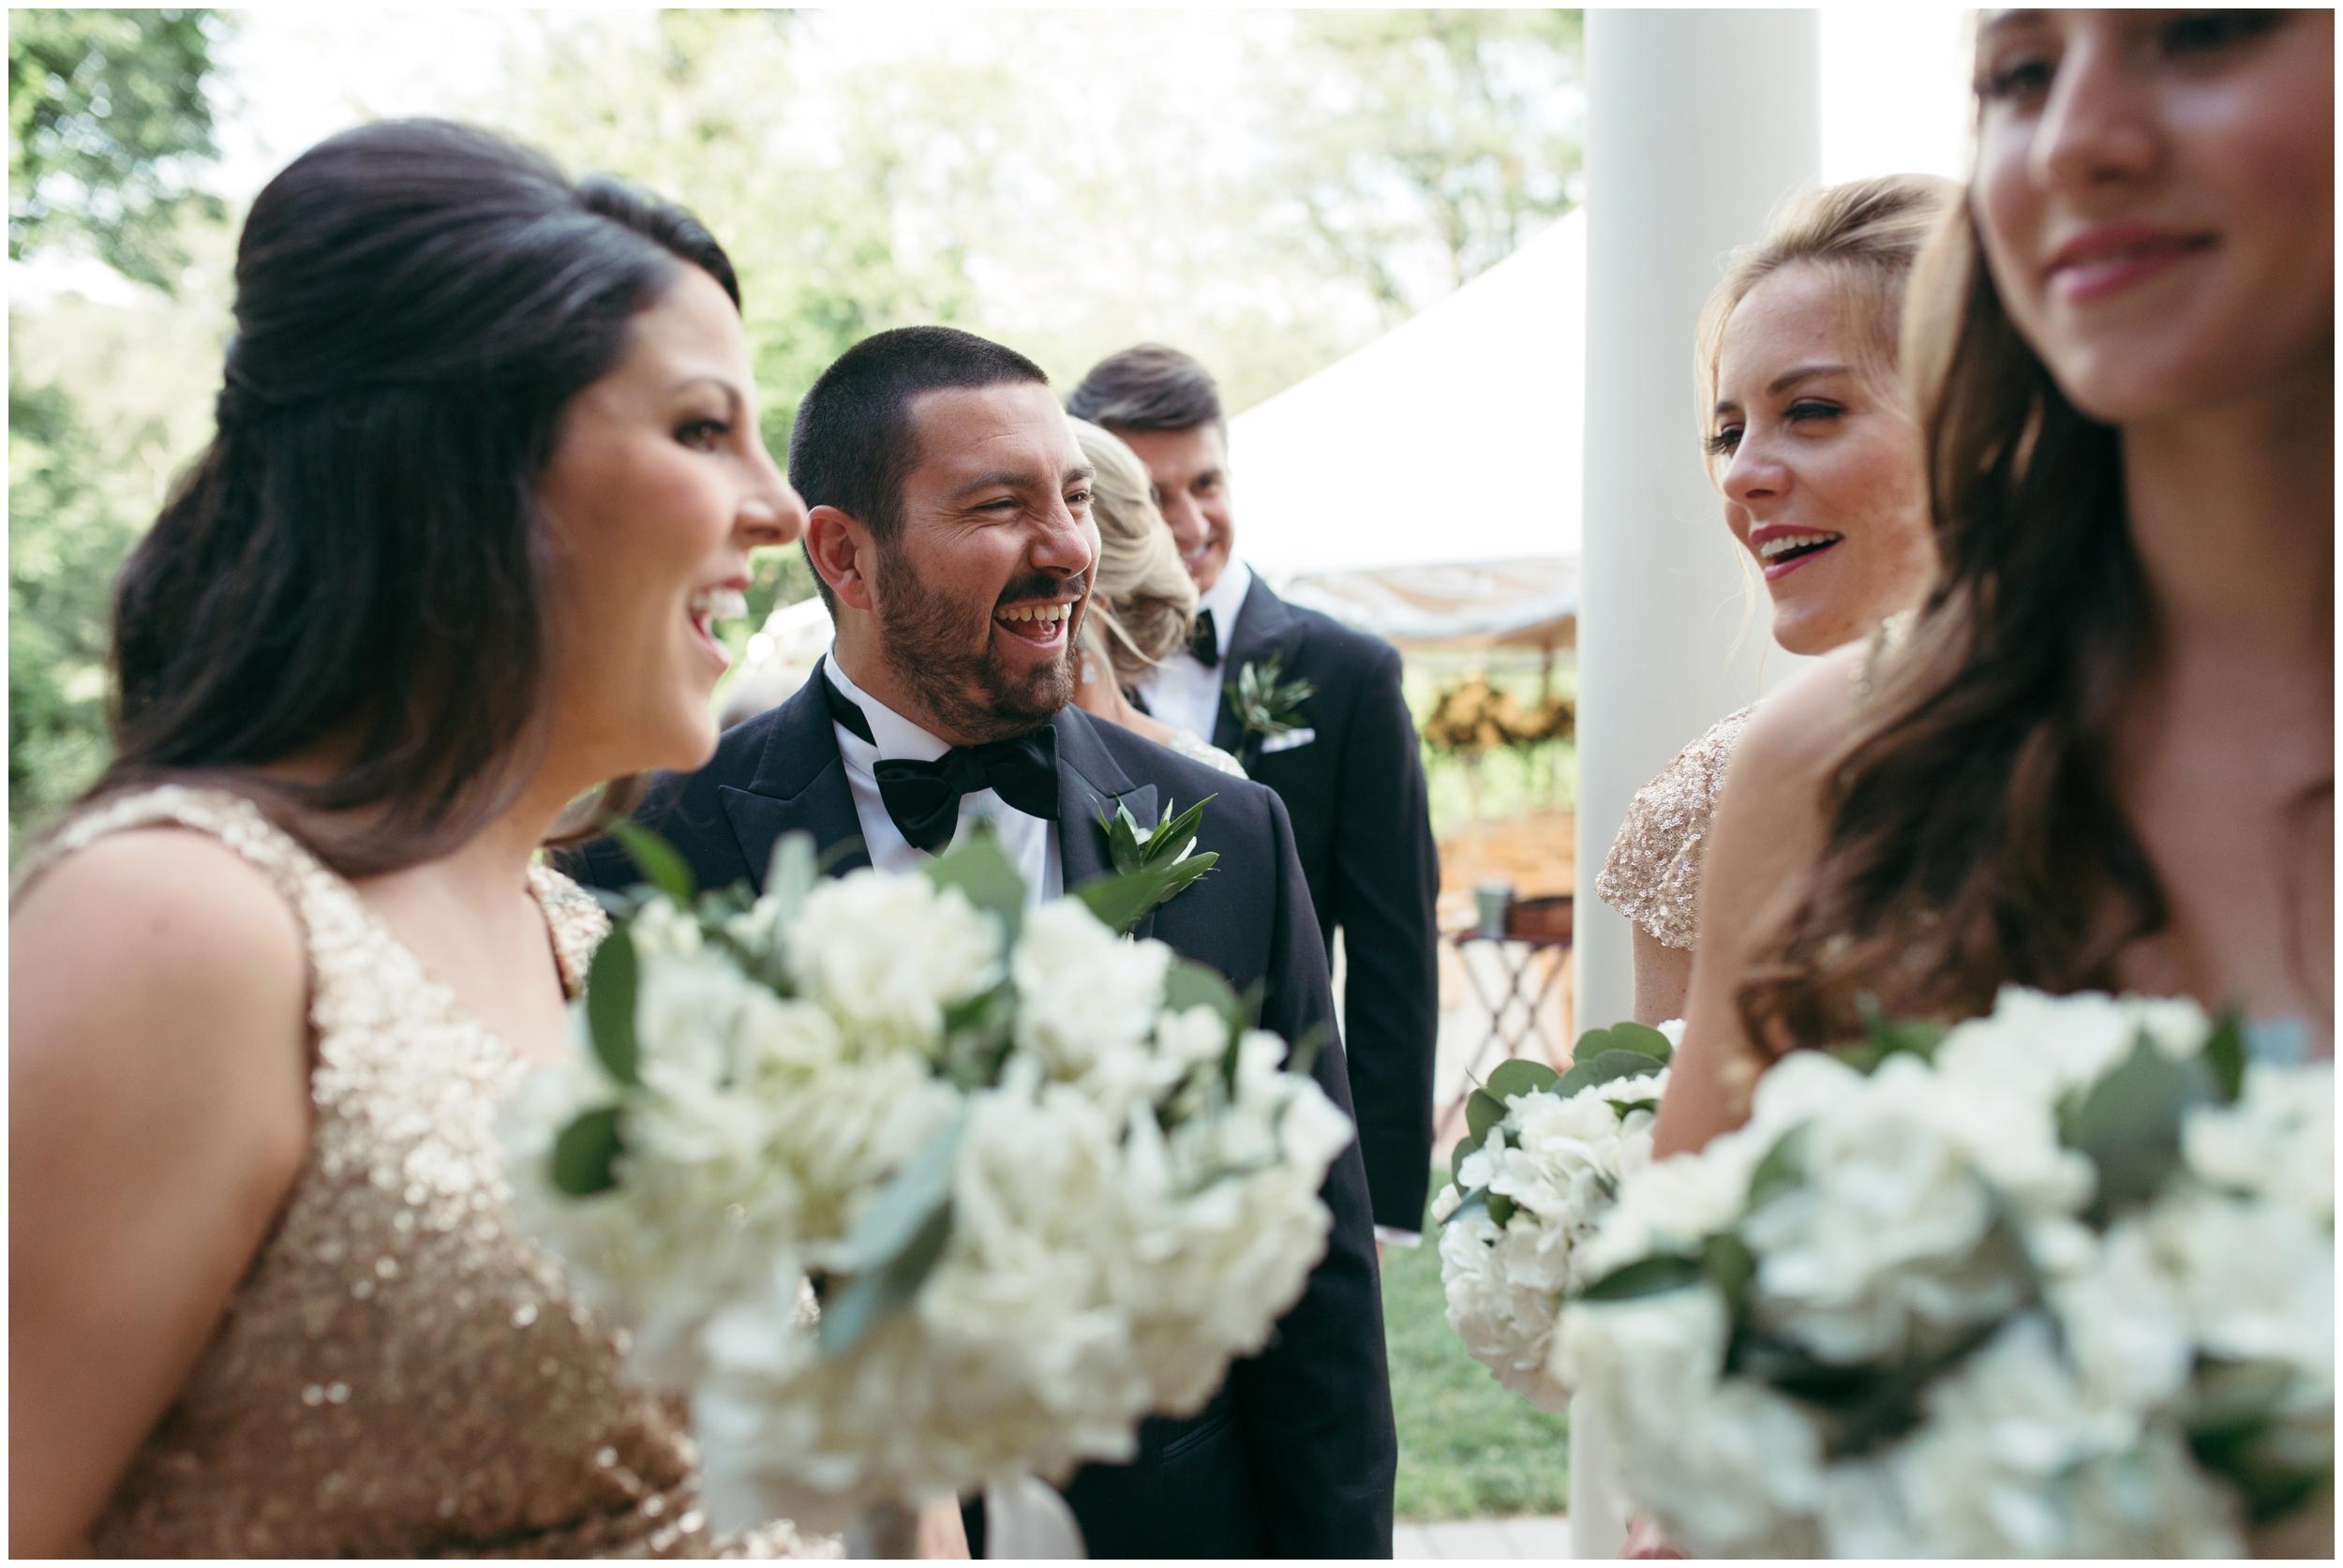 Willowdale-Estate-Wedding-Bailey-Q-Photo-Boston-Wedding-Photographer-050.JPG